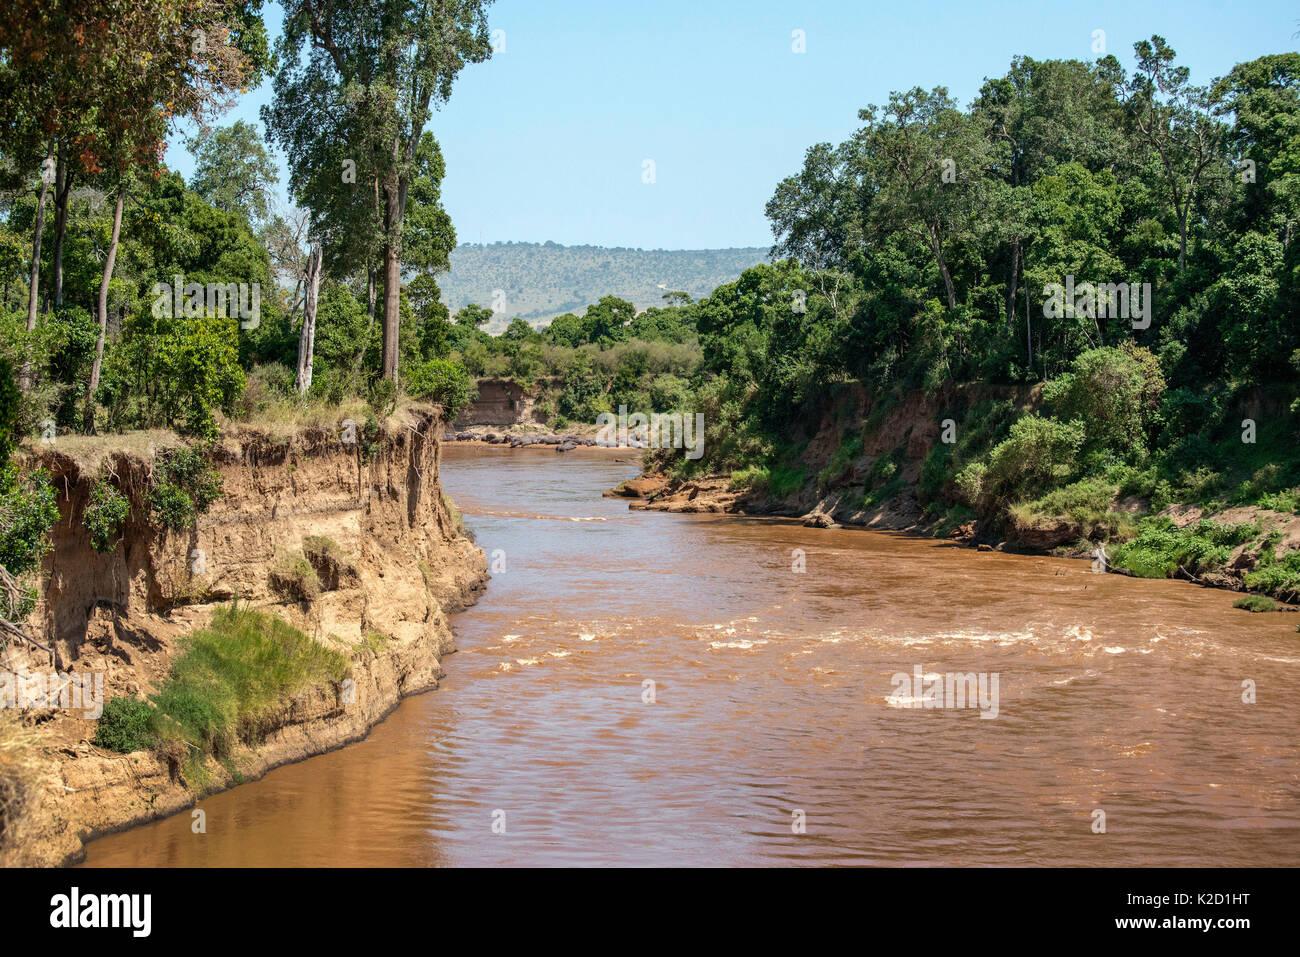 Mara River, Masai Mara National Reserve, Rift Valley Province, Kenya, East Africa, August 2012. Stock Photo